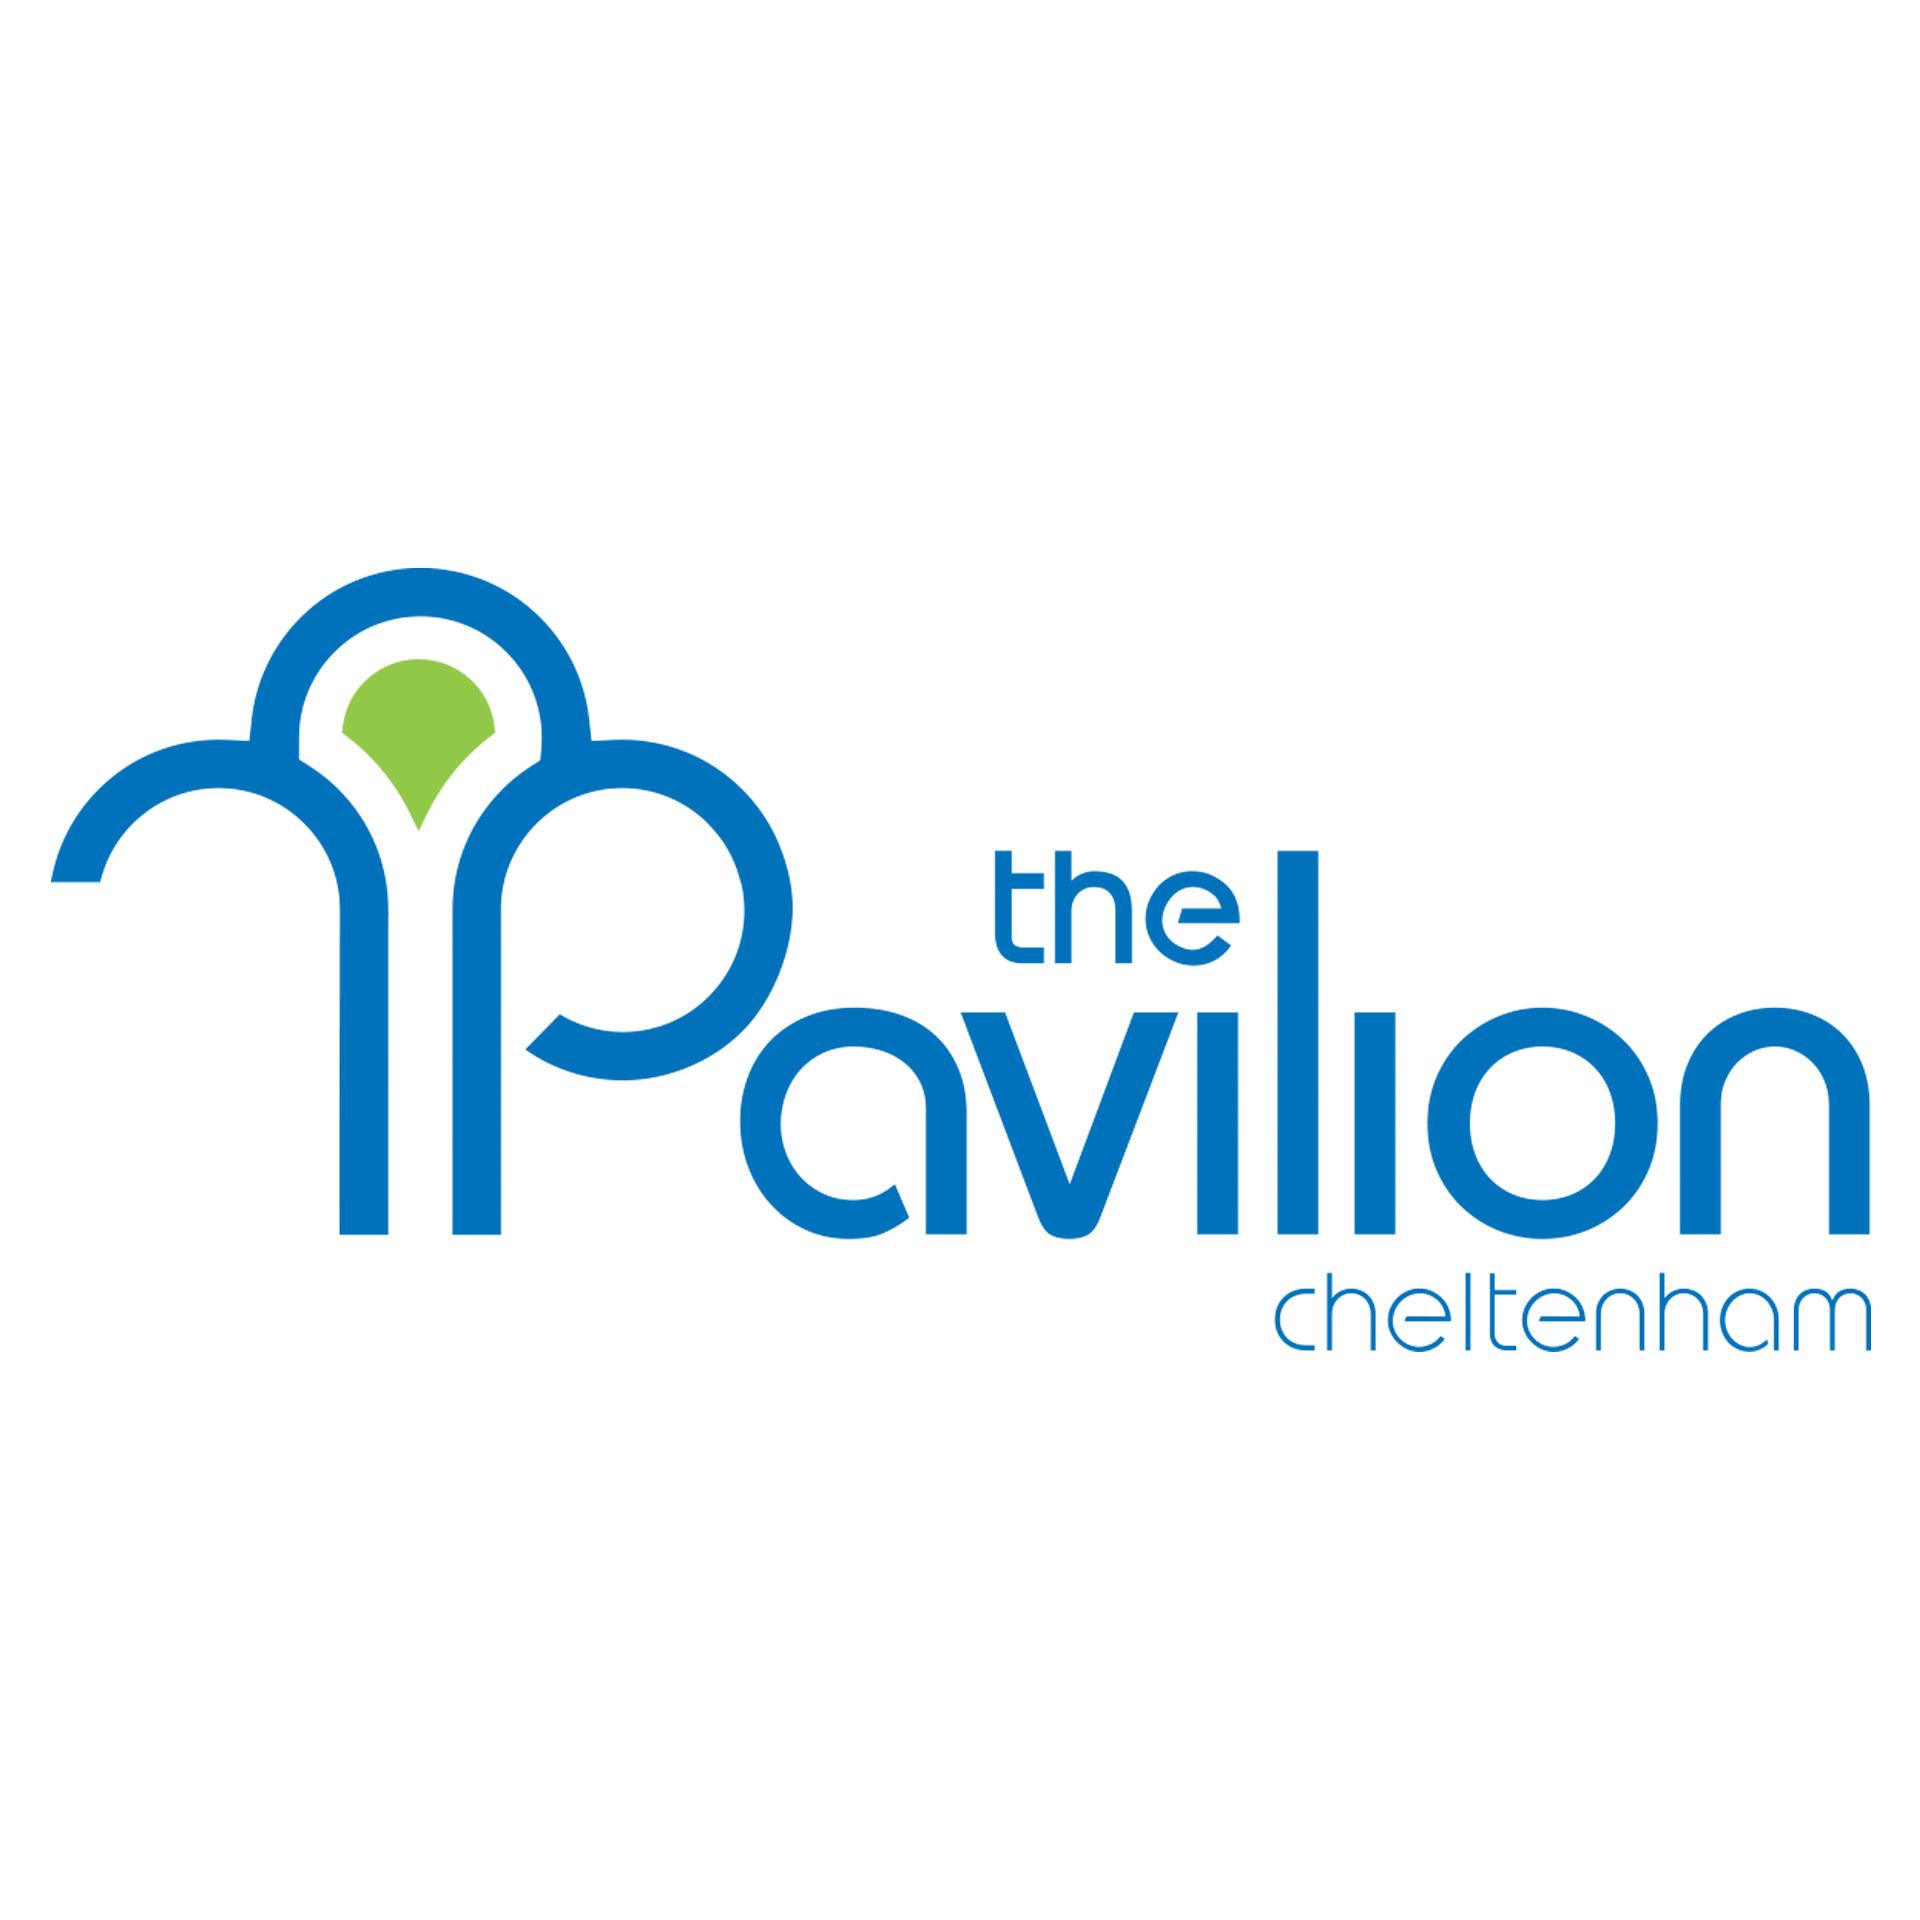 The Pavilion branding